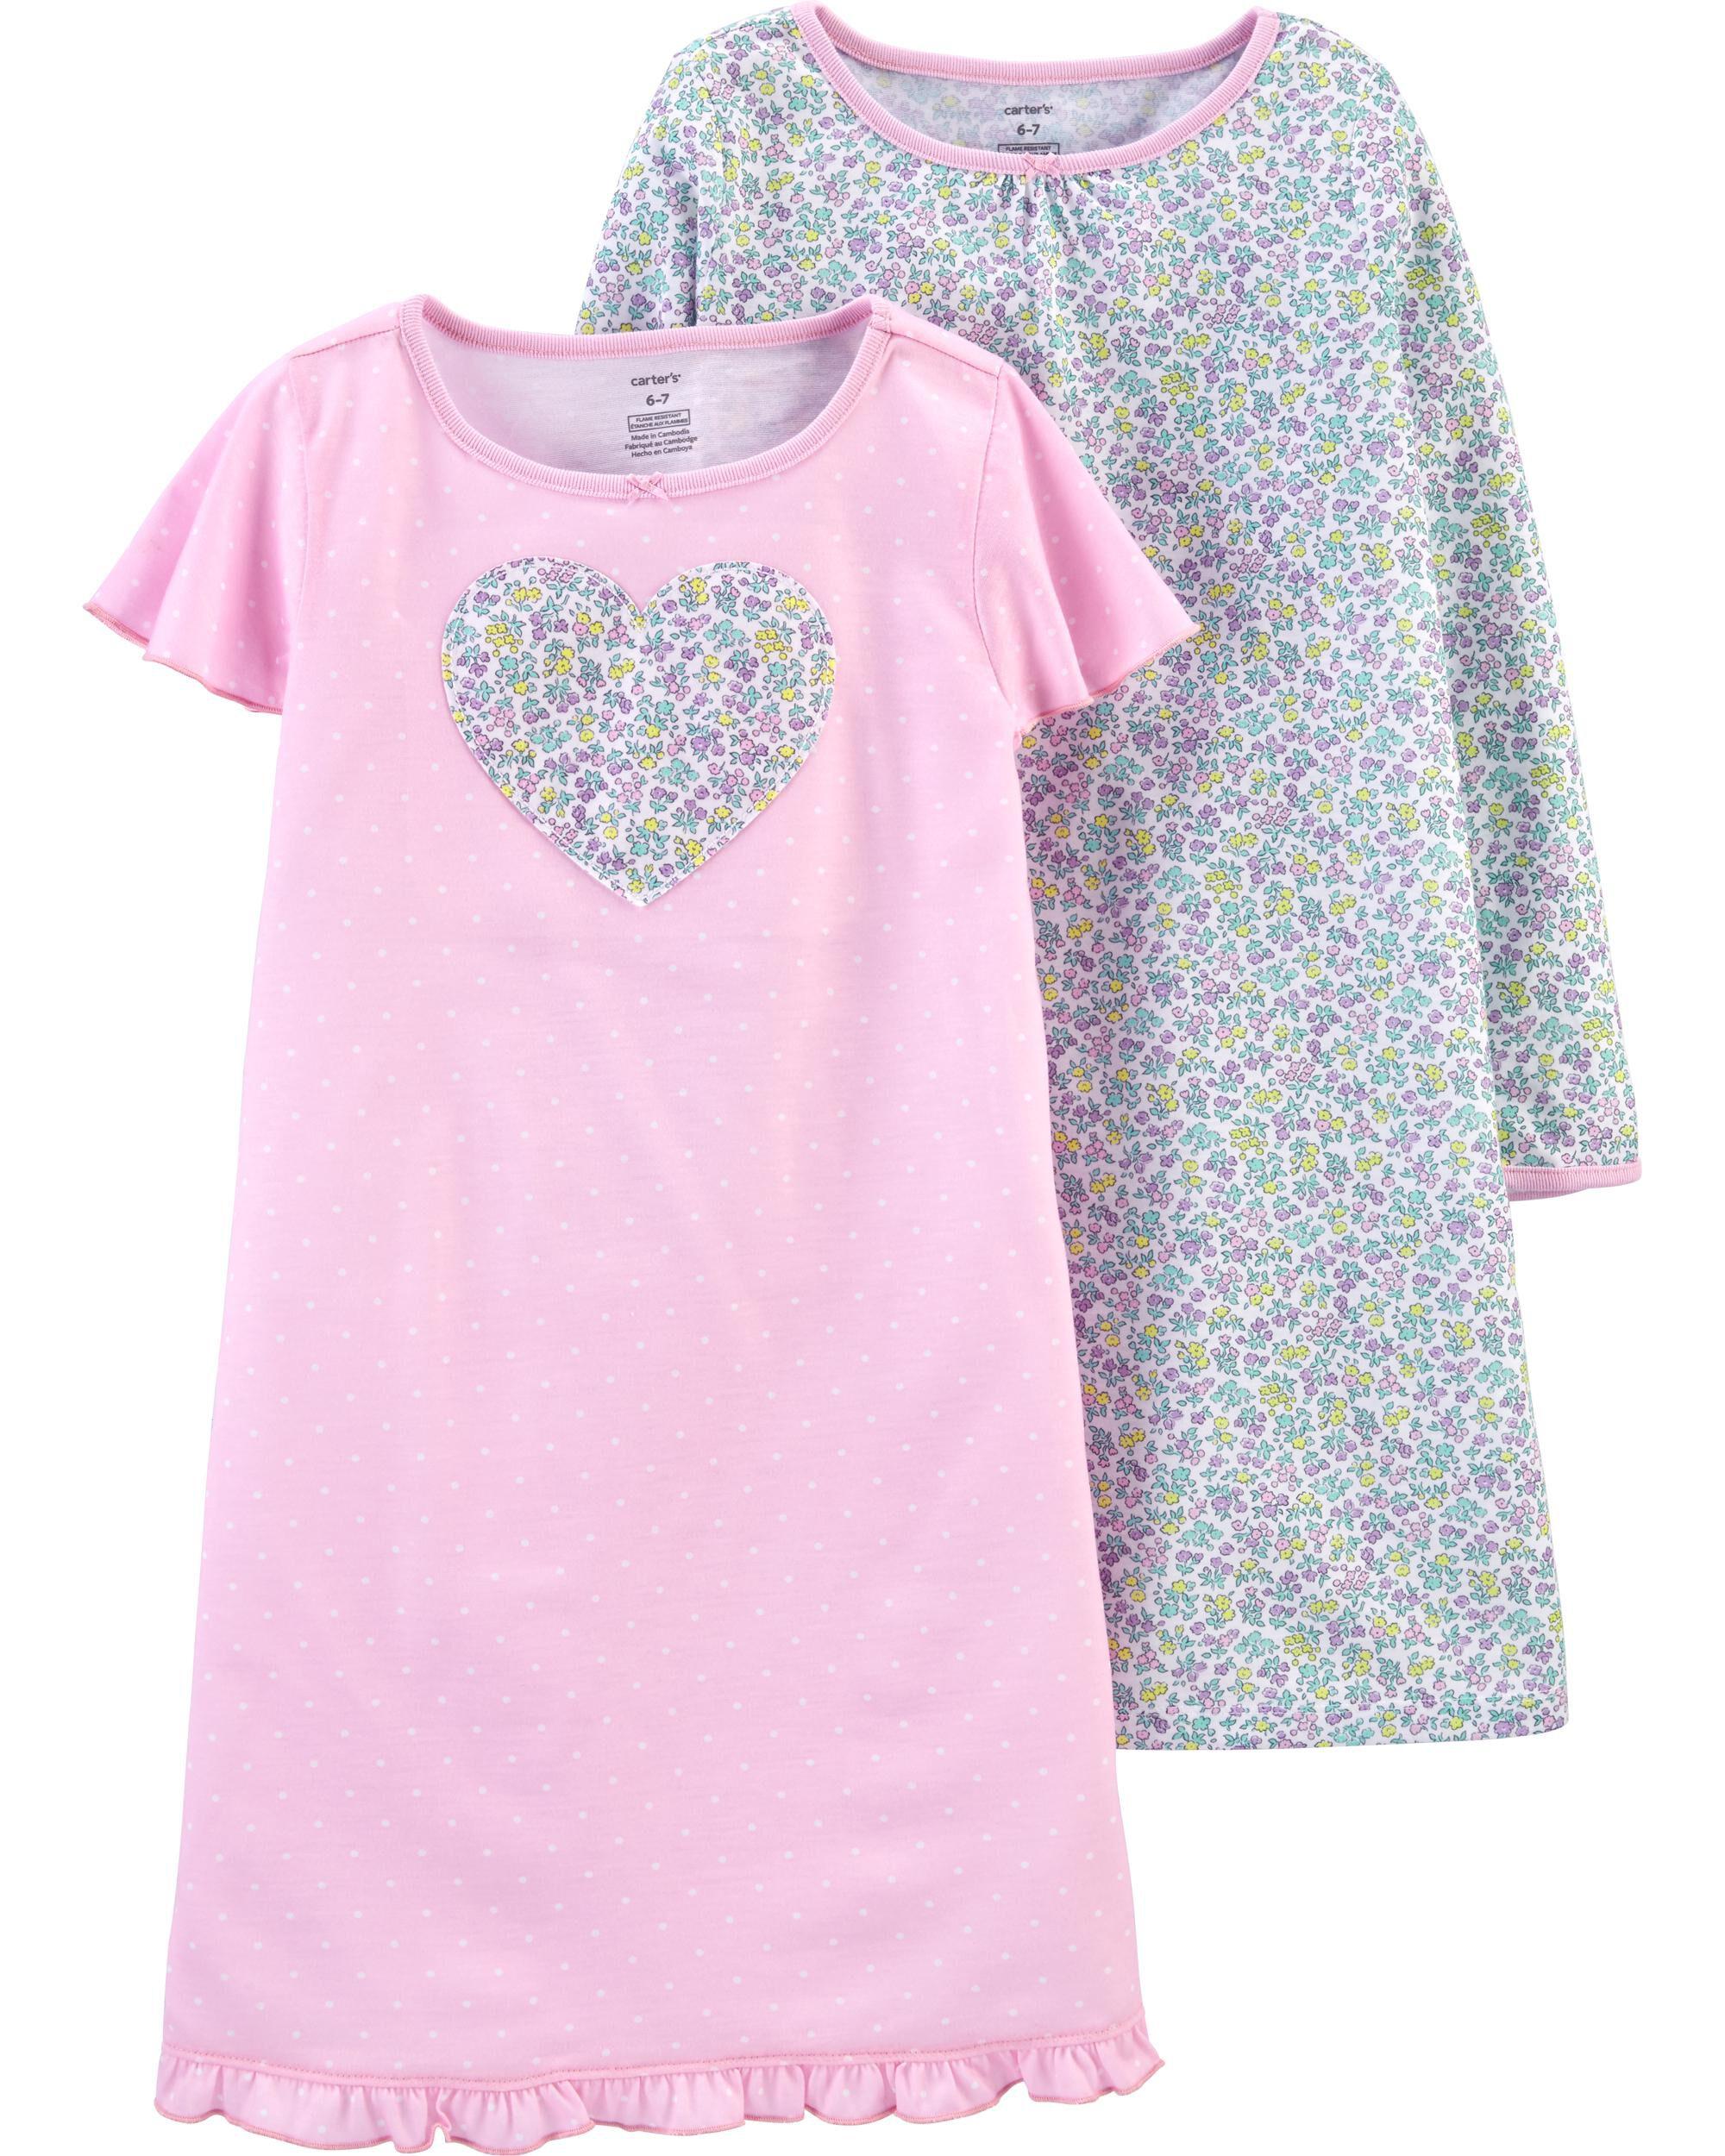 NWT baby toddler Girl boy DUCK pajama set 6 12 month 1 2 3 4 5 years